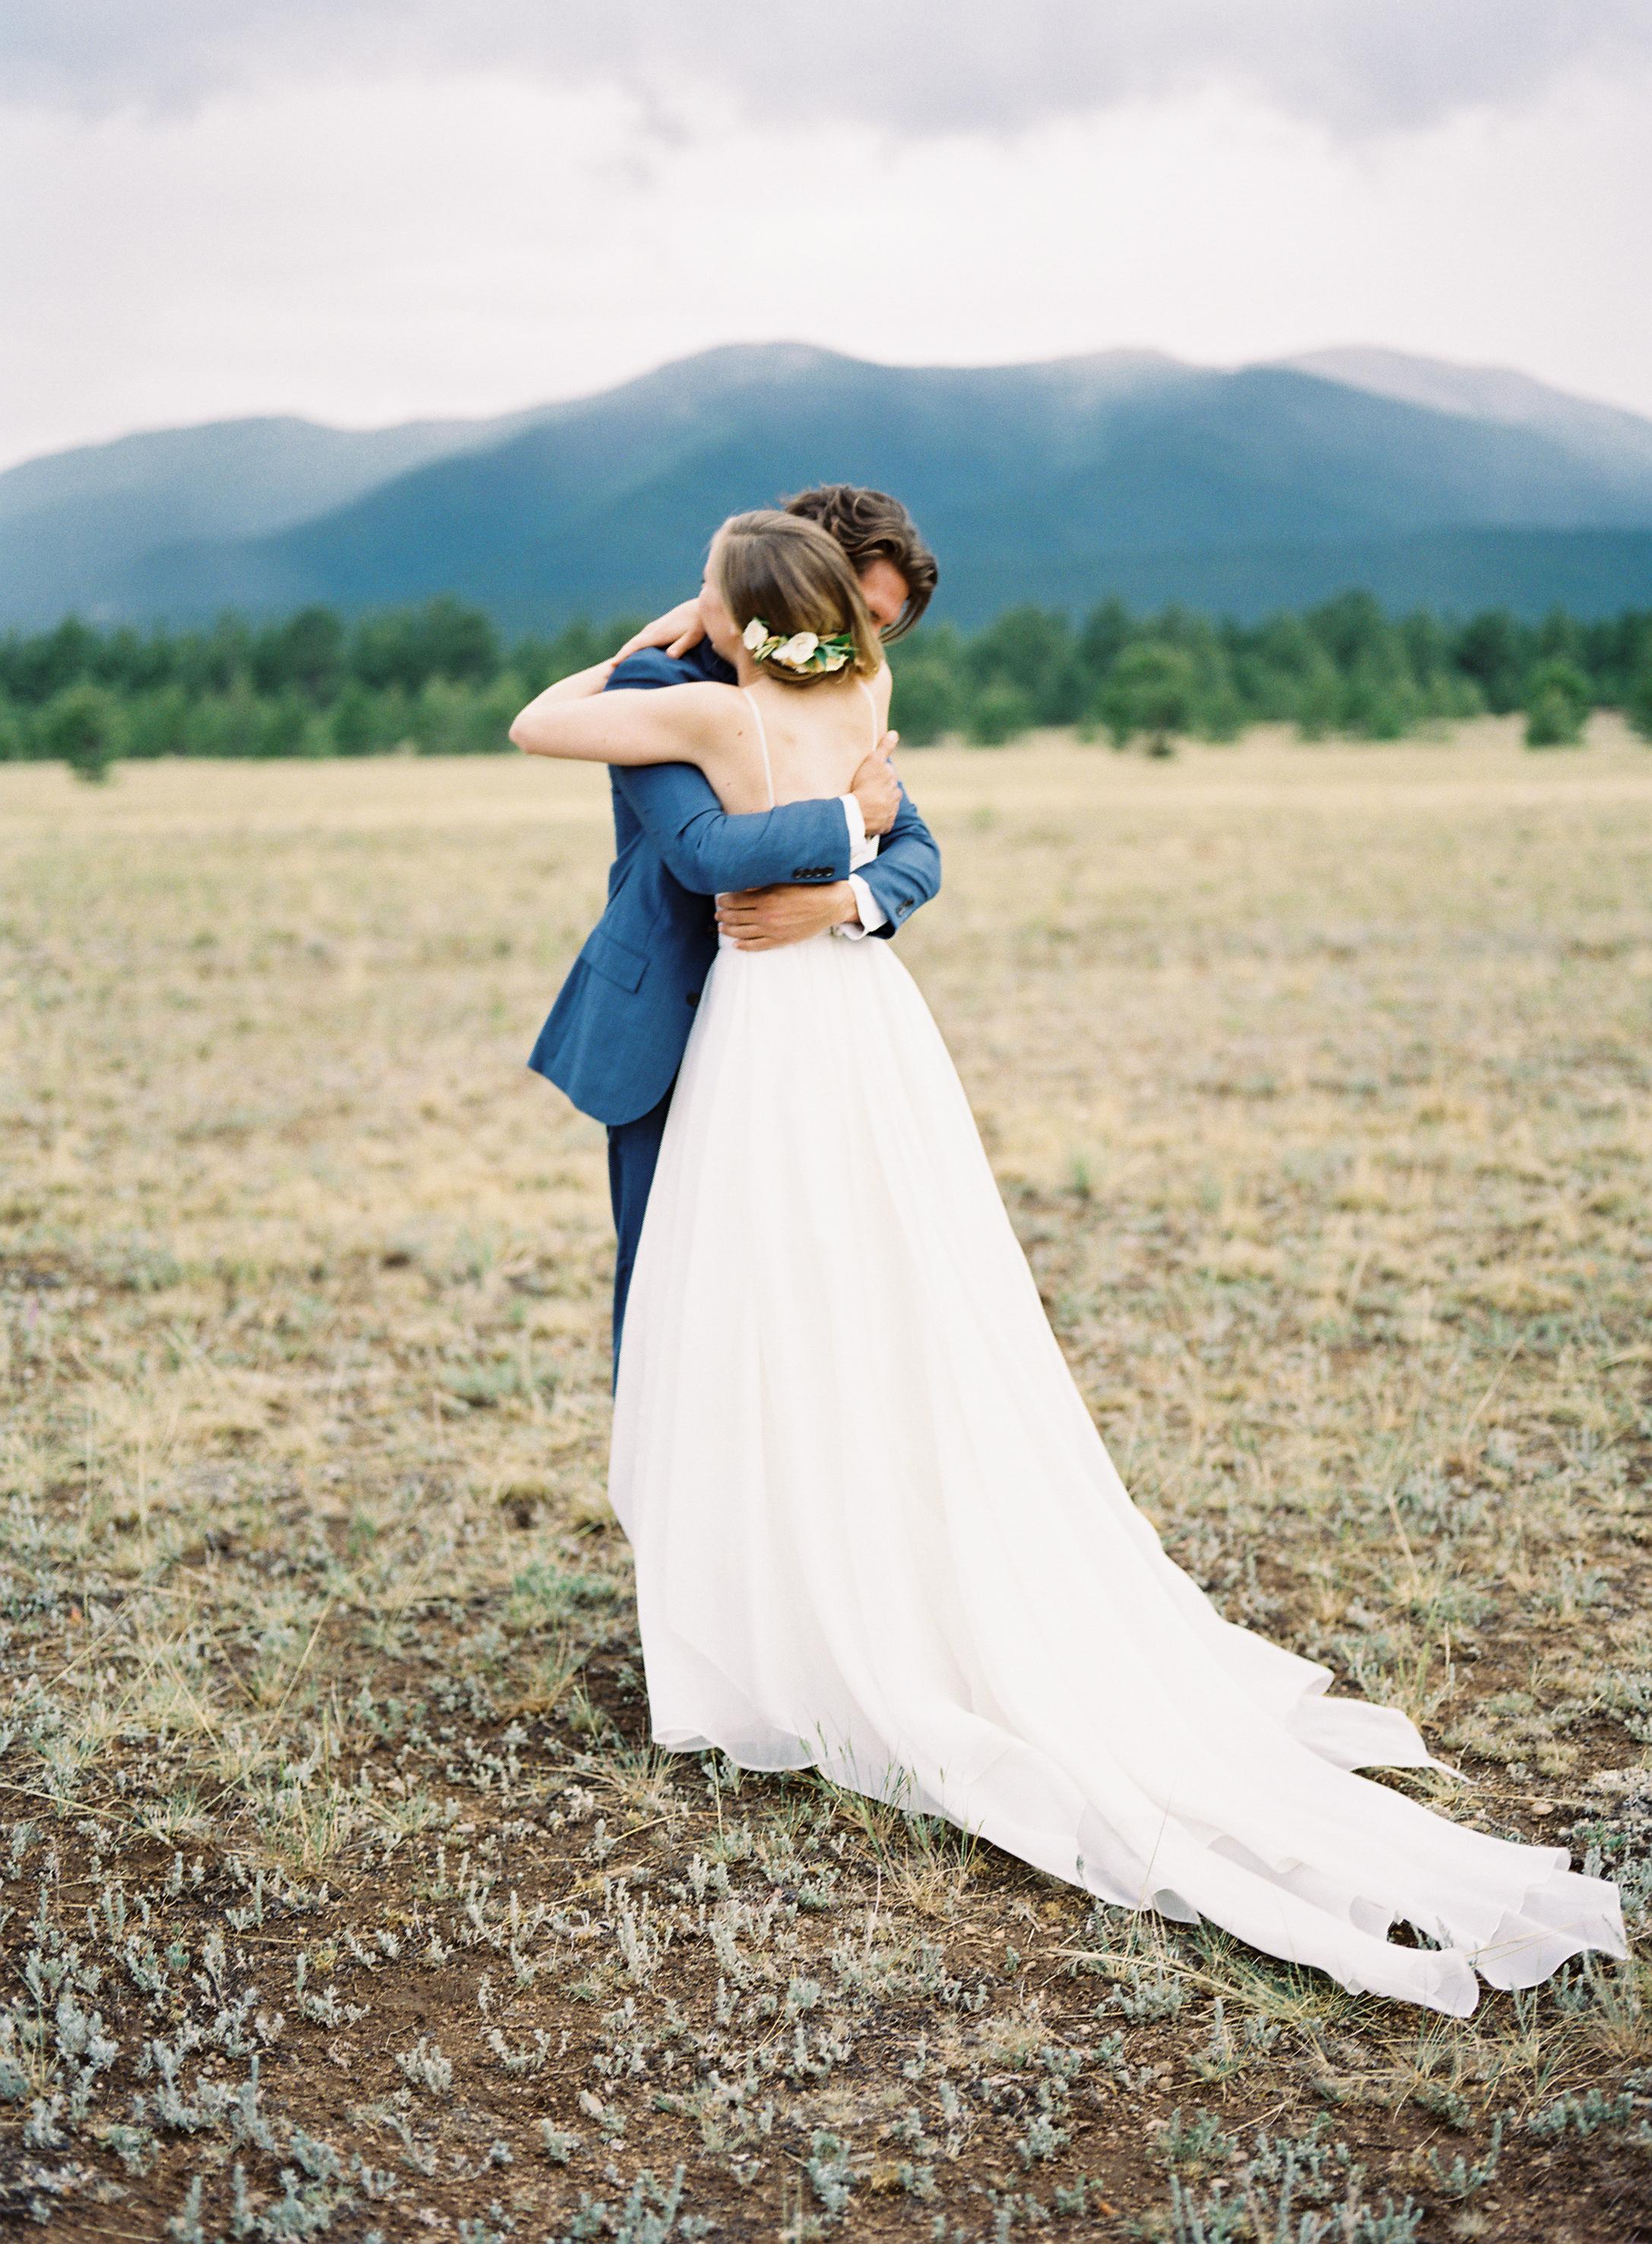 Jessica and Thomas-Wedding-Carrie King Photographer-11.jpg